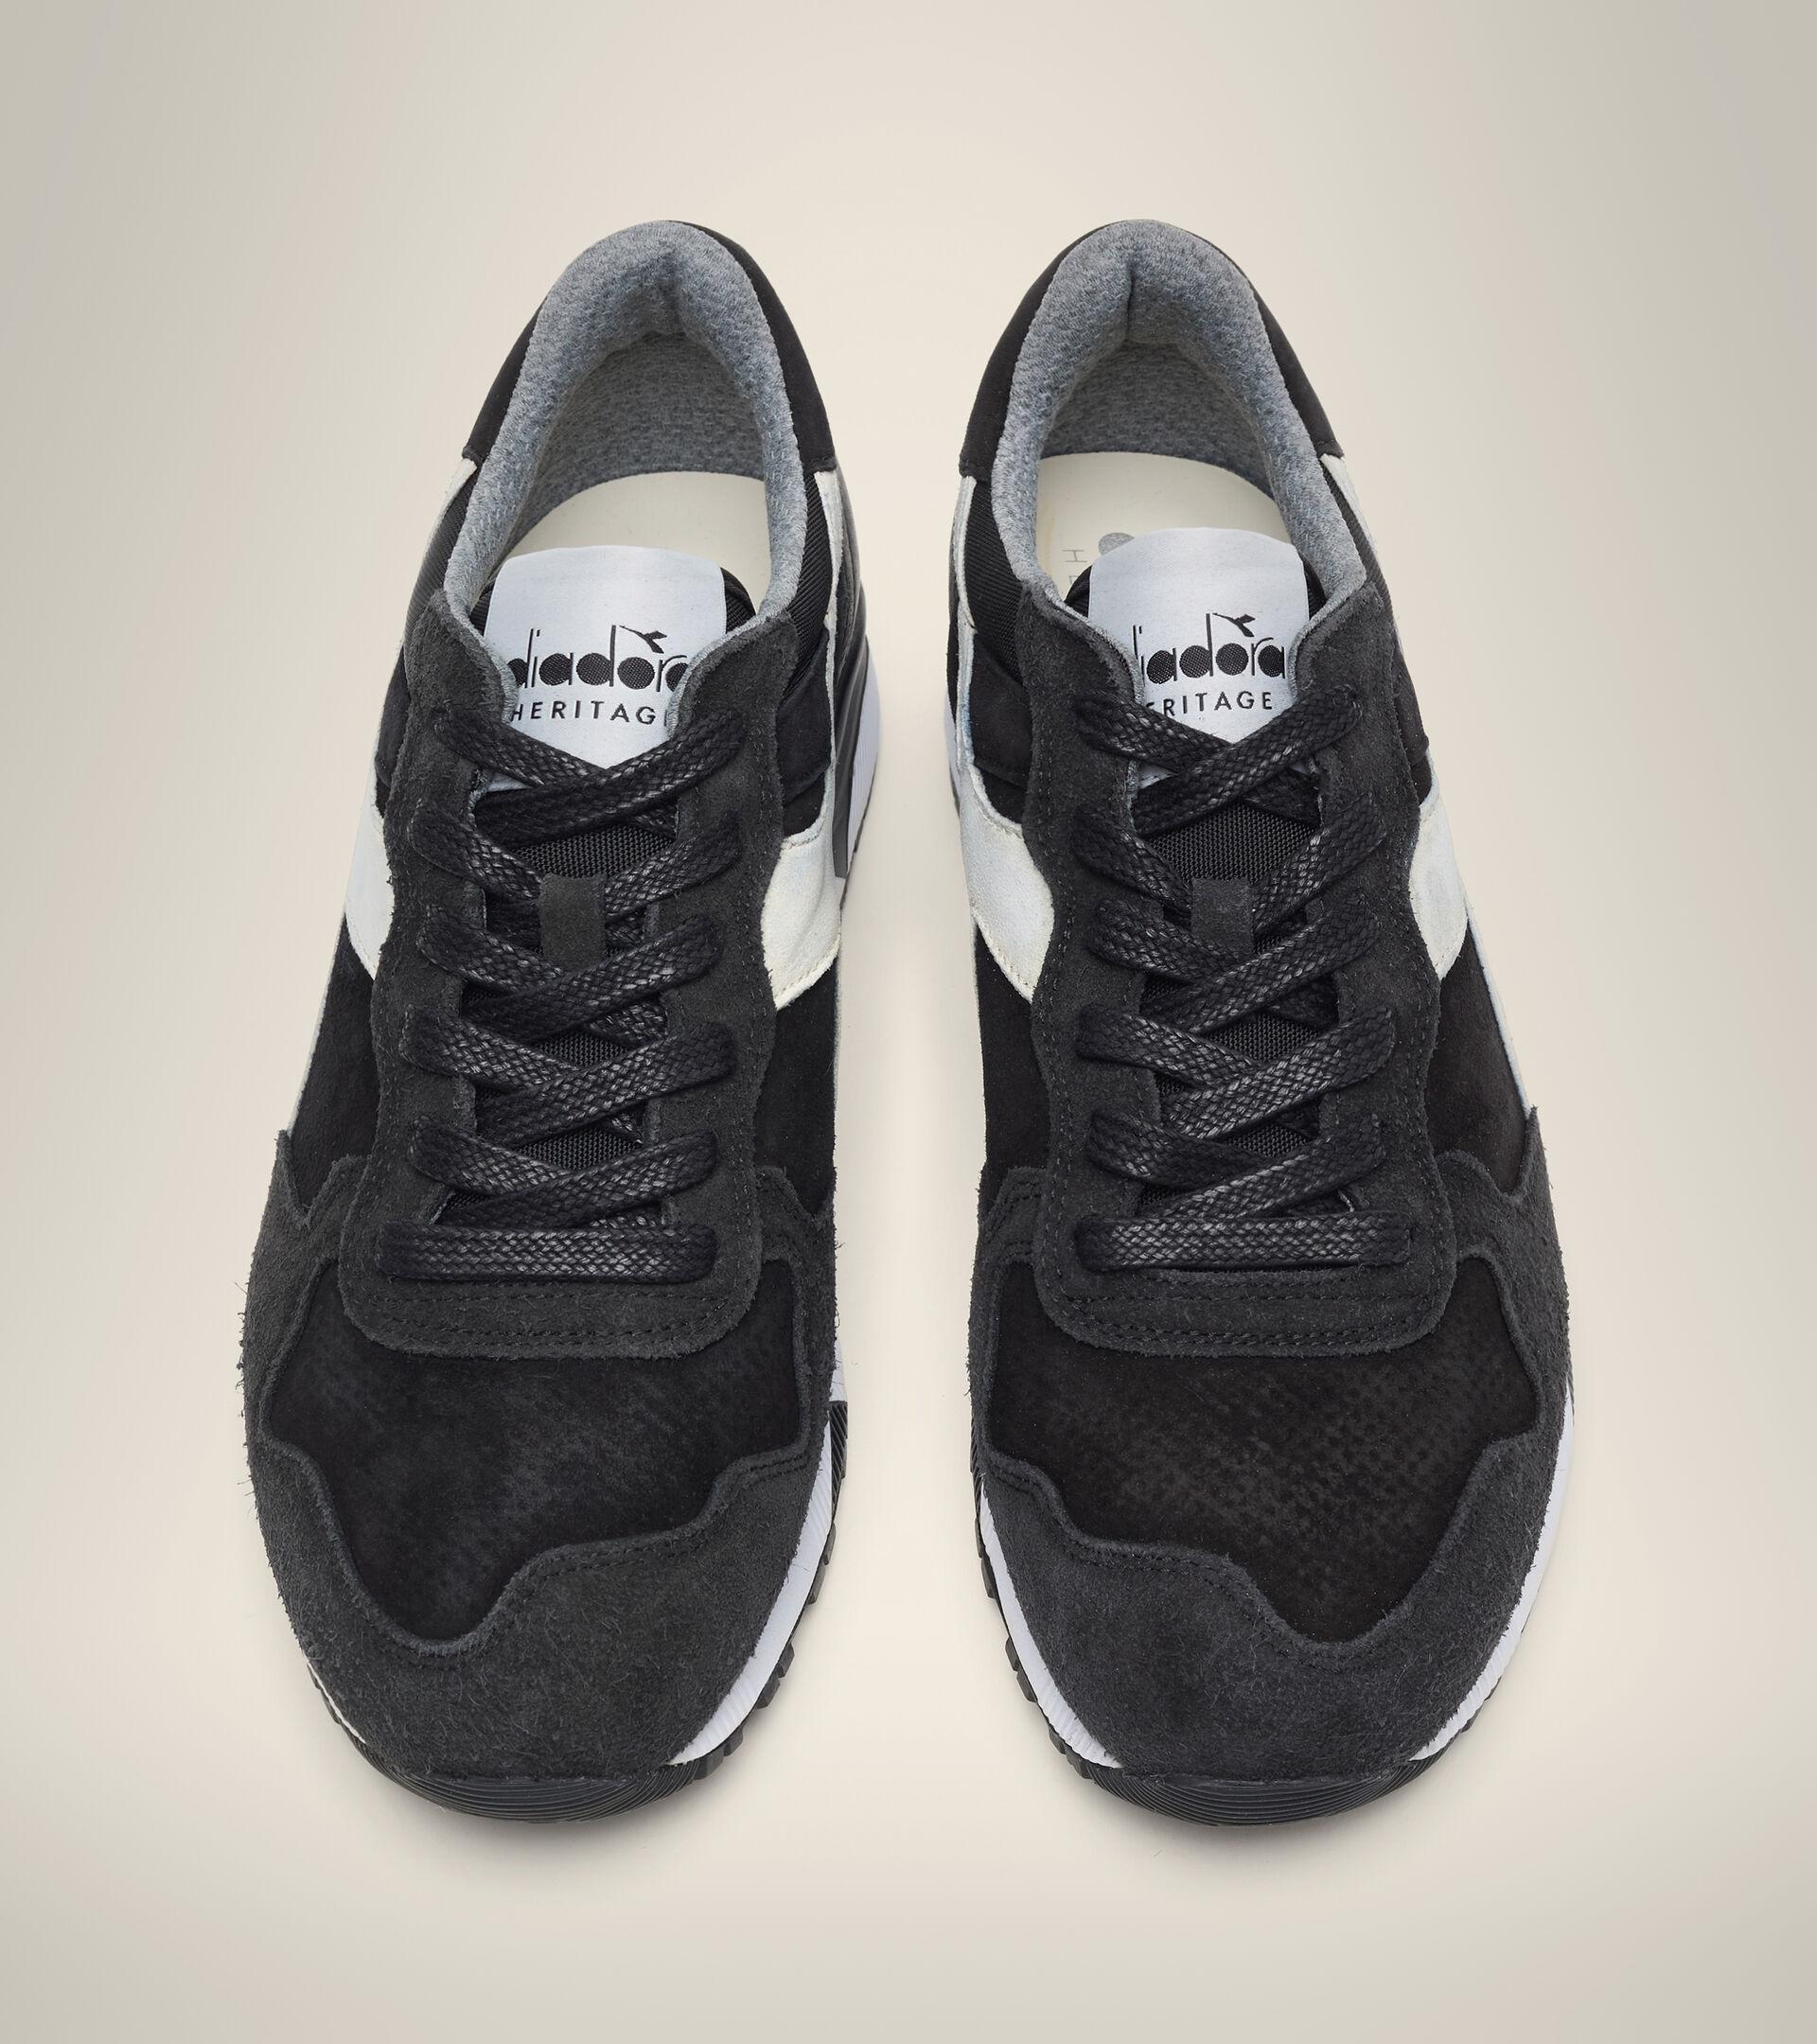 Footwear Heritage UOMO TRIDENT 90 LEATHER NERO Diadora